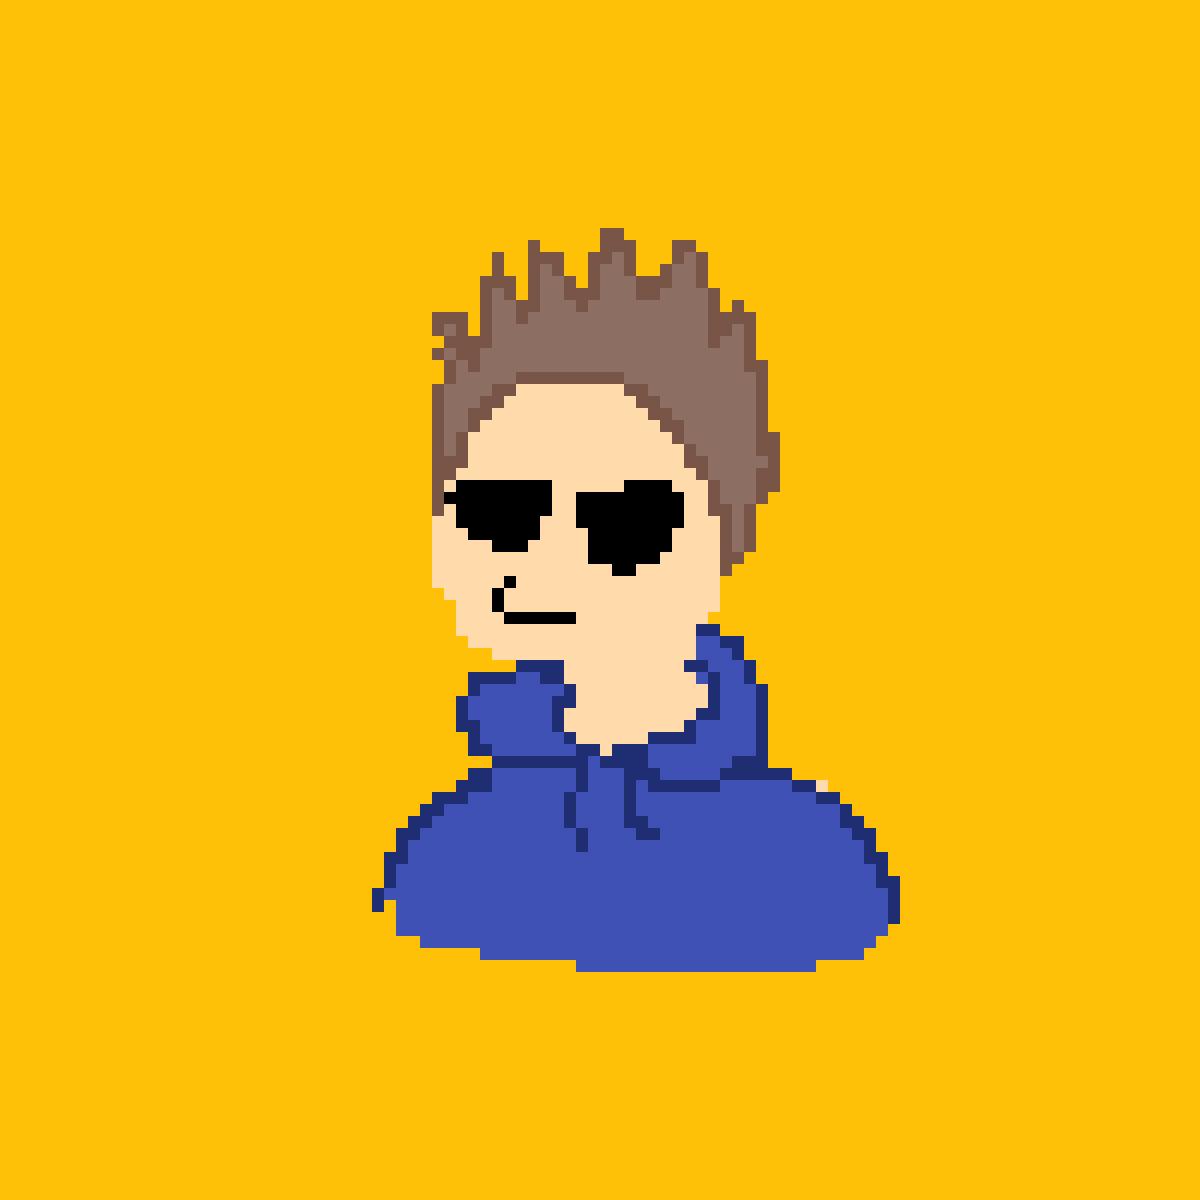 Tom from Eddsworld